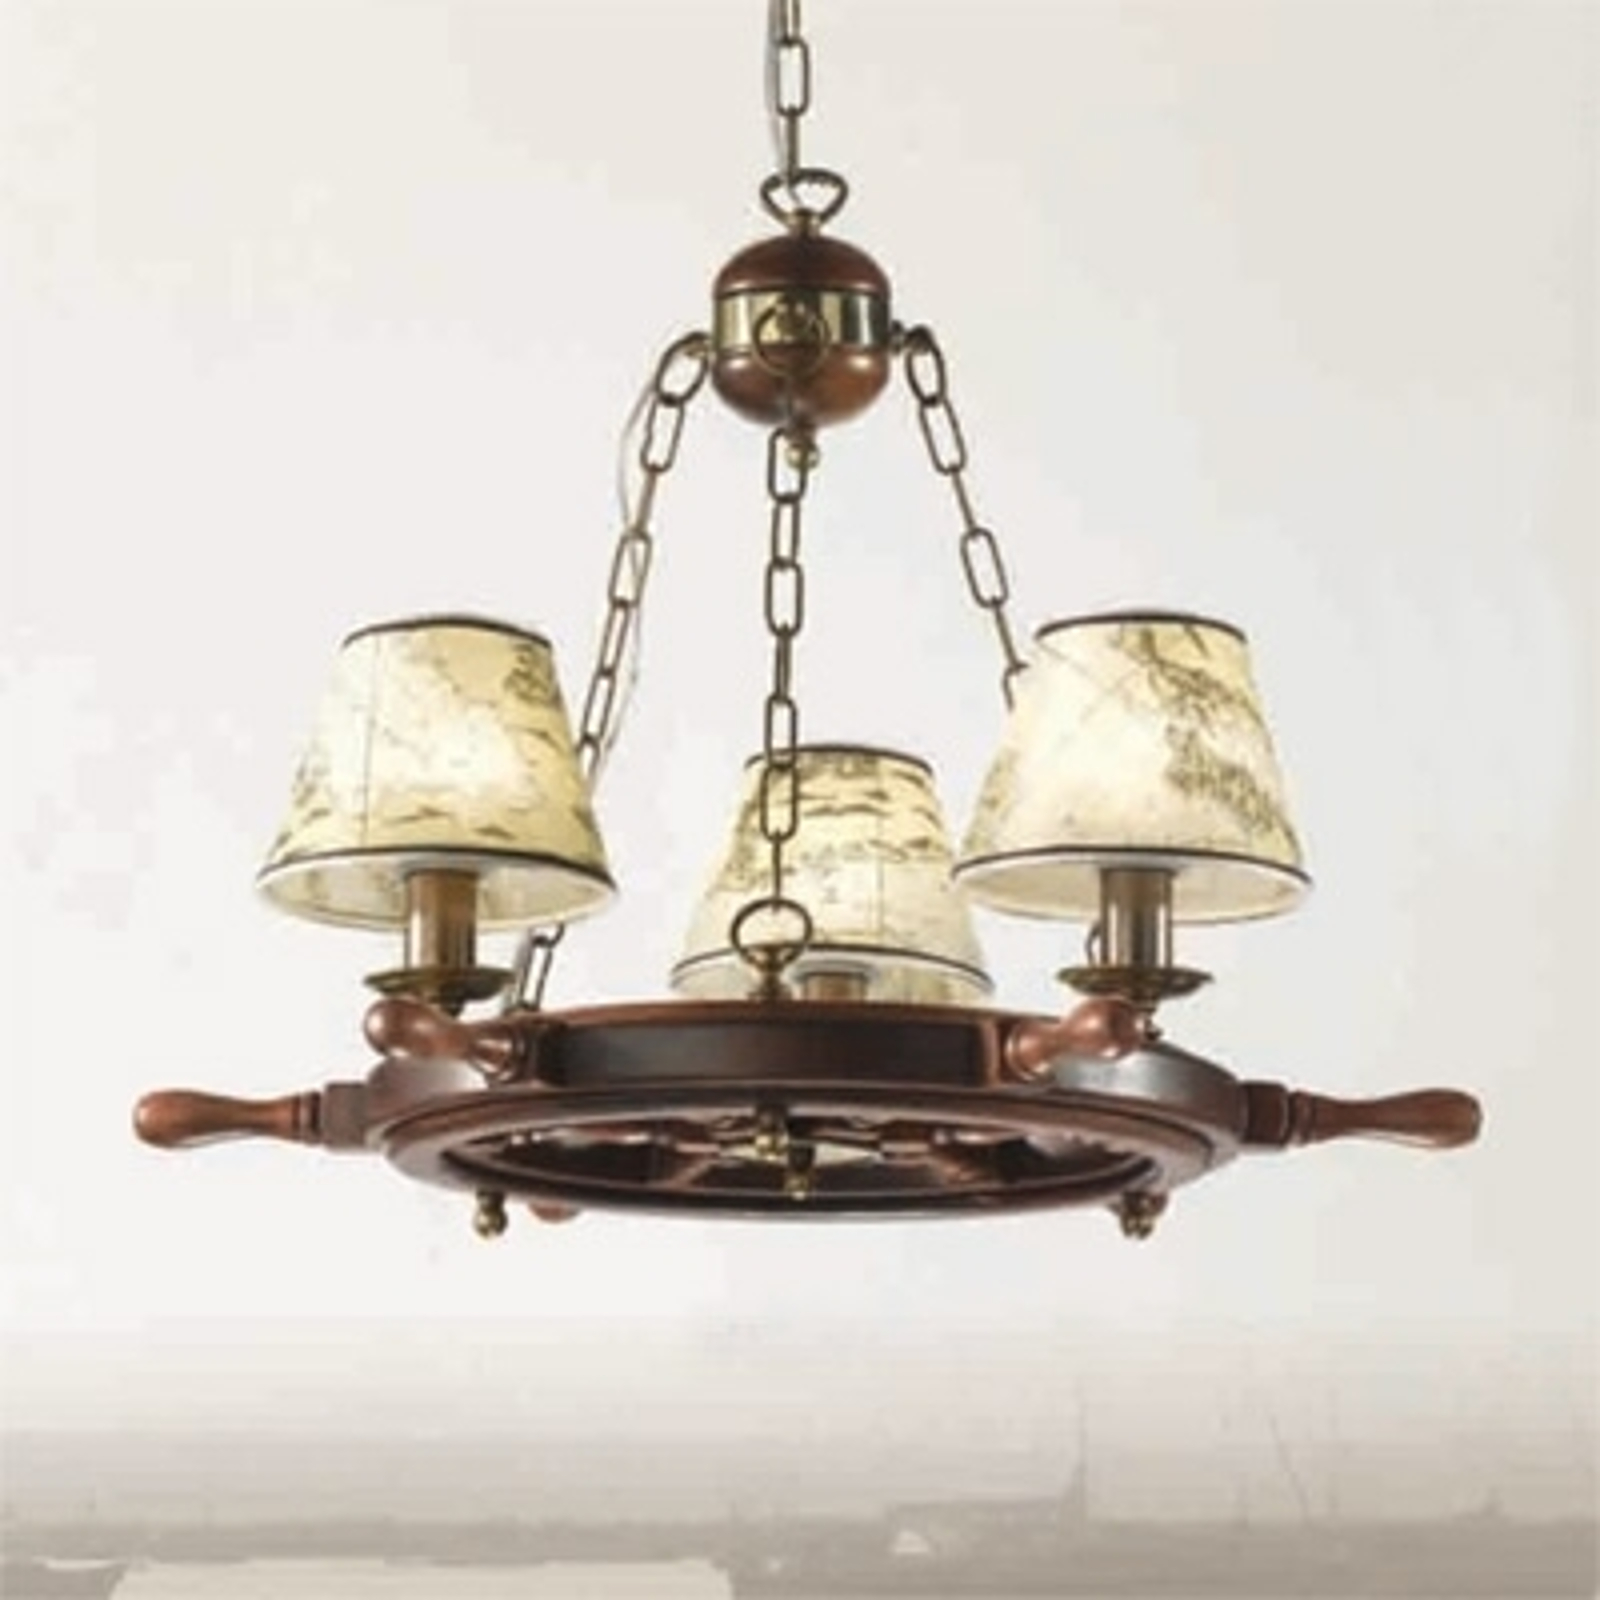 Indrukwekkende kroonluchter Porto 3-lichts